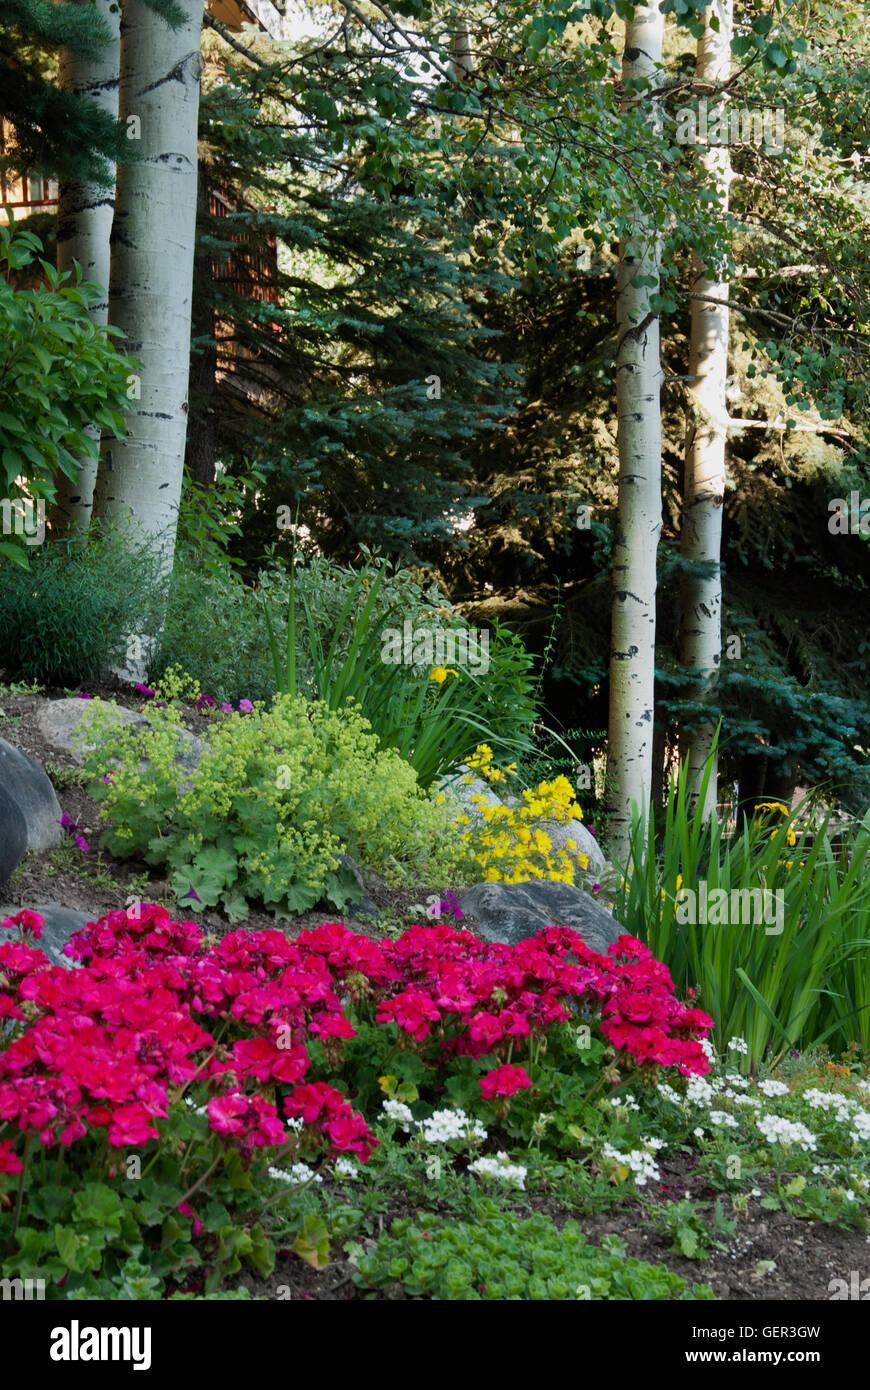 Vail Colorado Garden With Alchemilla And Geranium Stock Photo